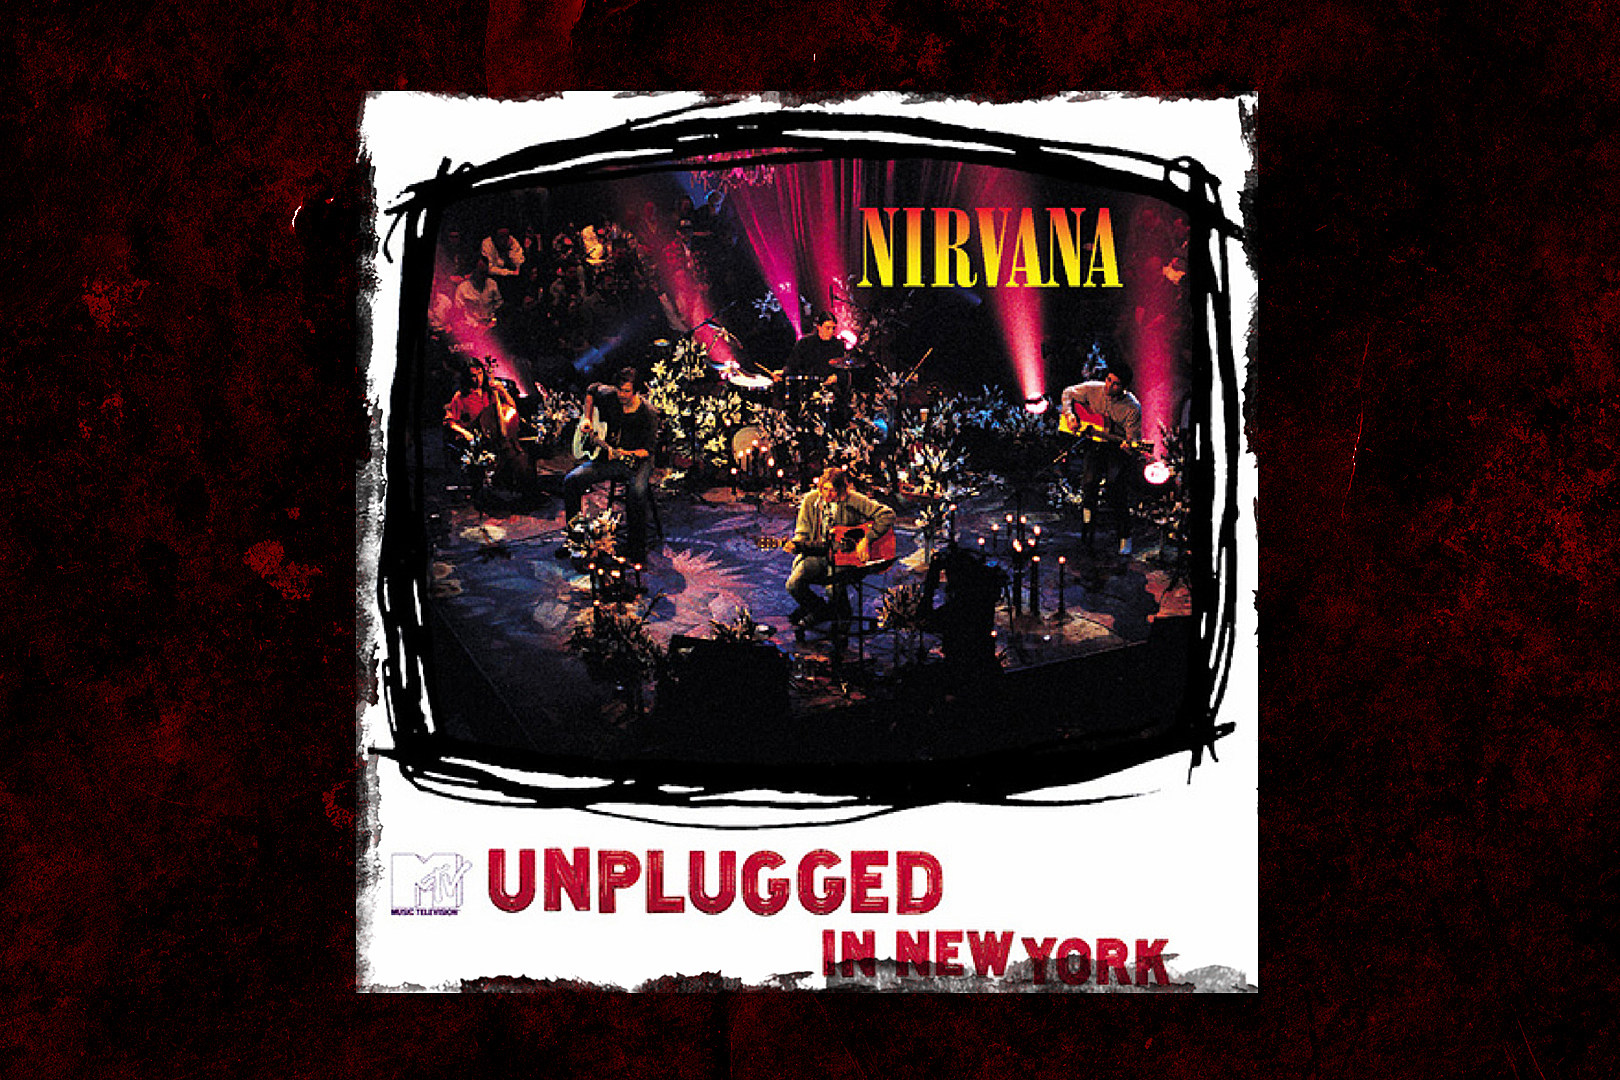 unplugged nirvana